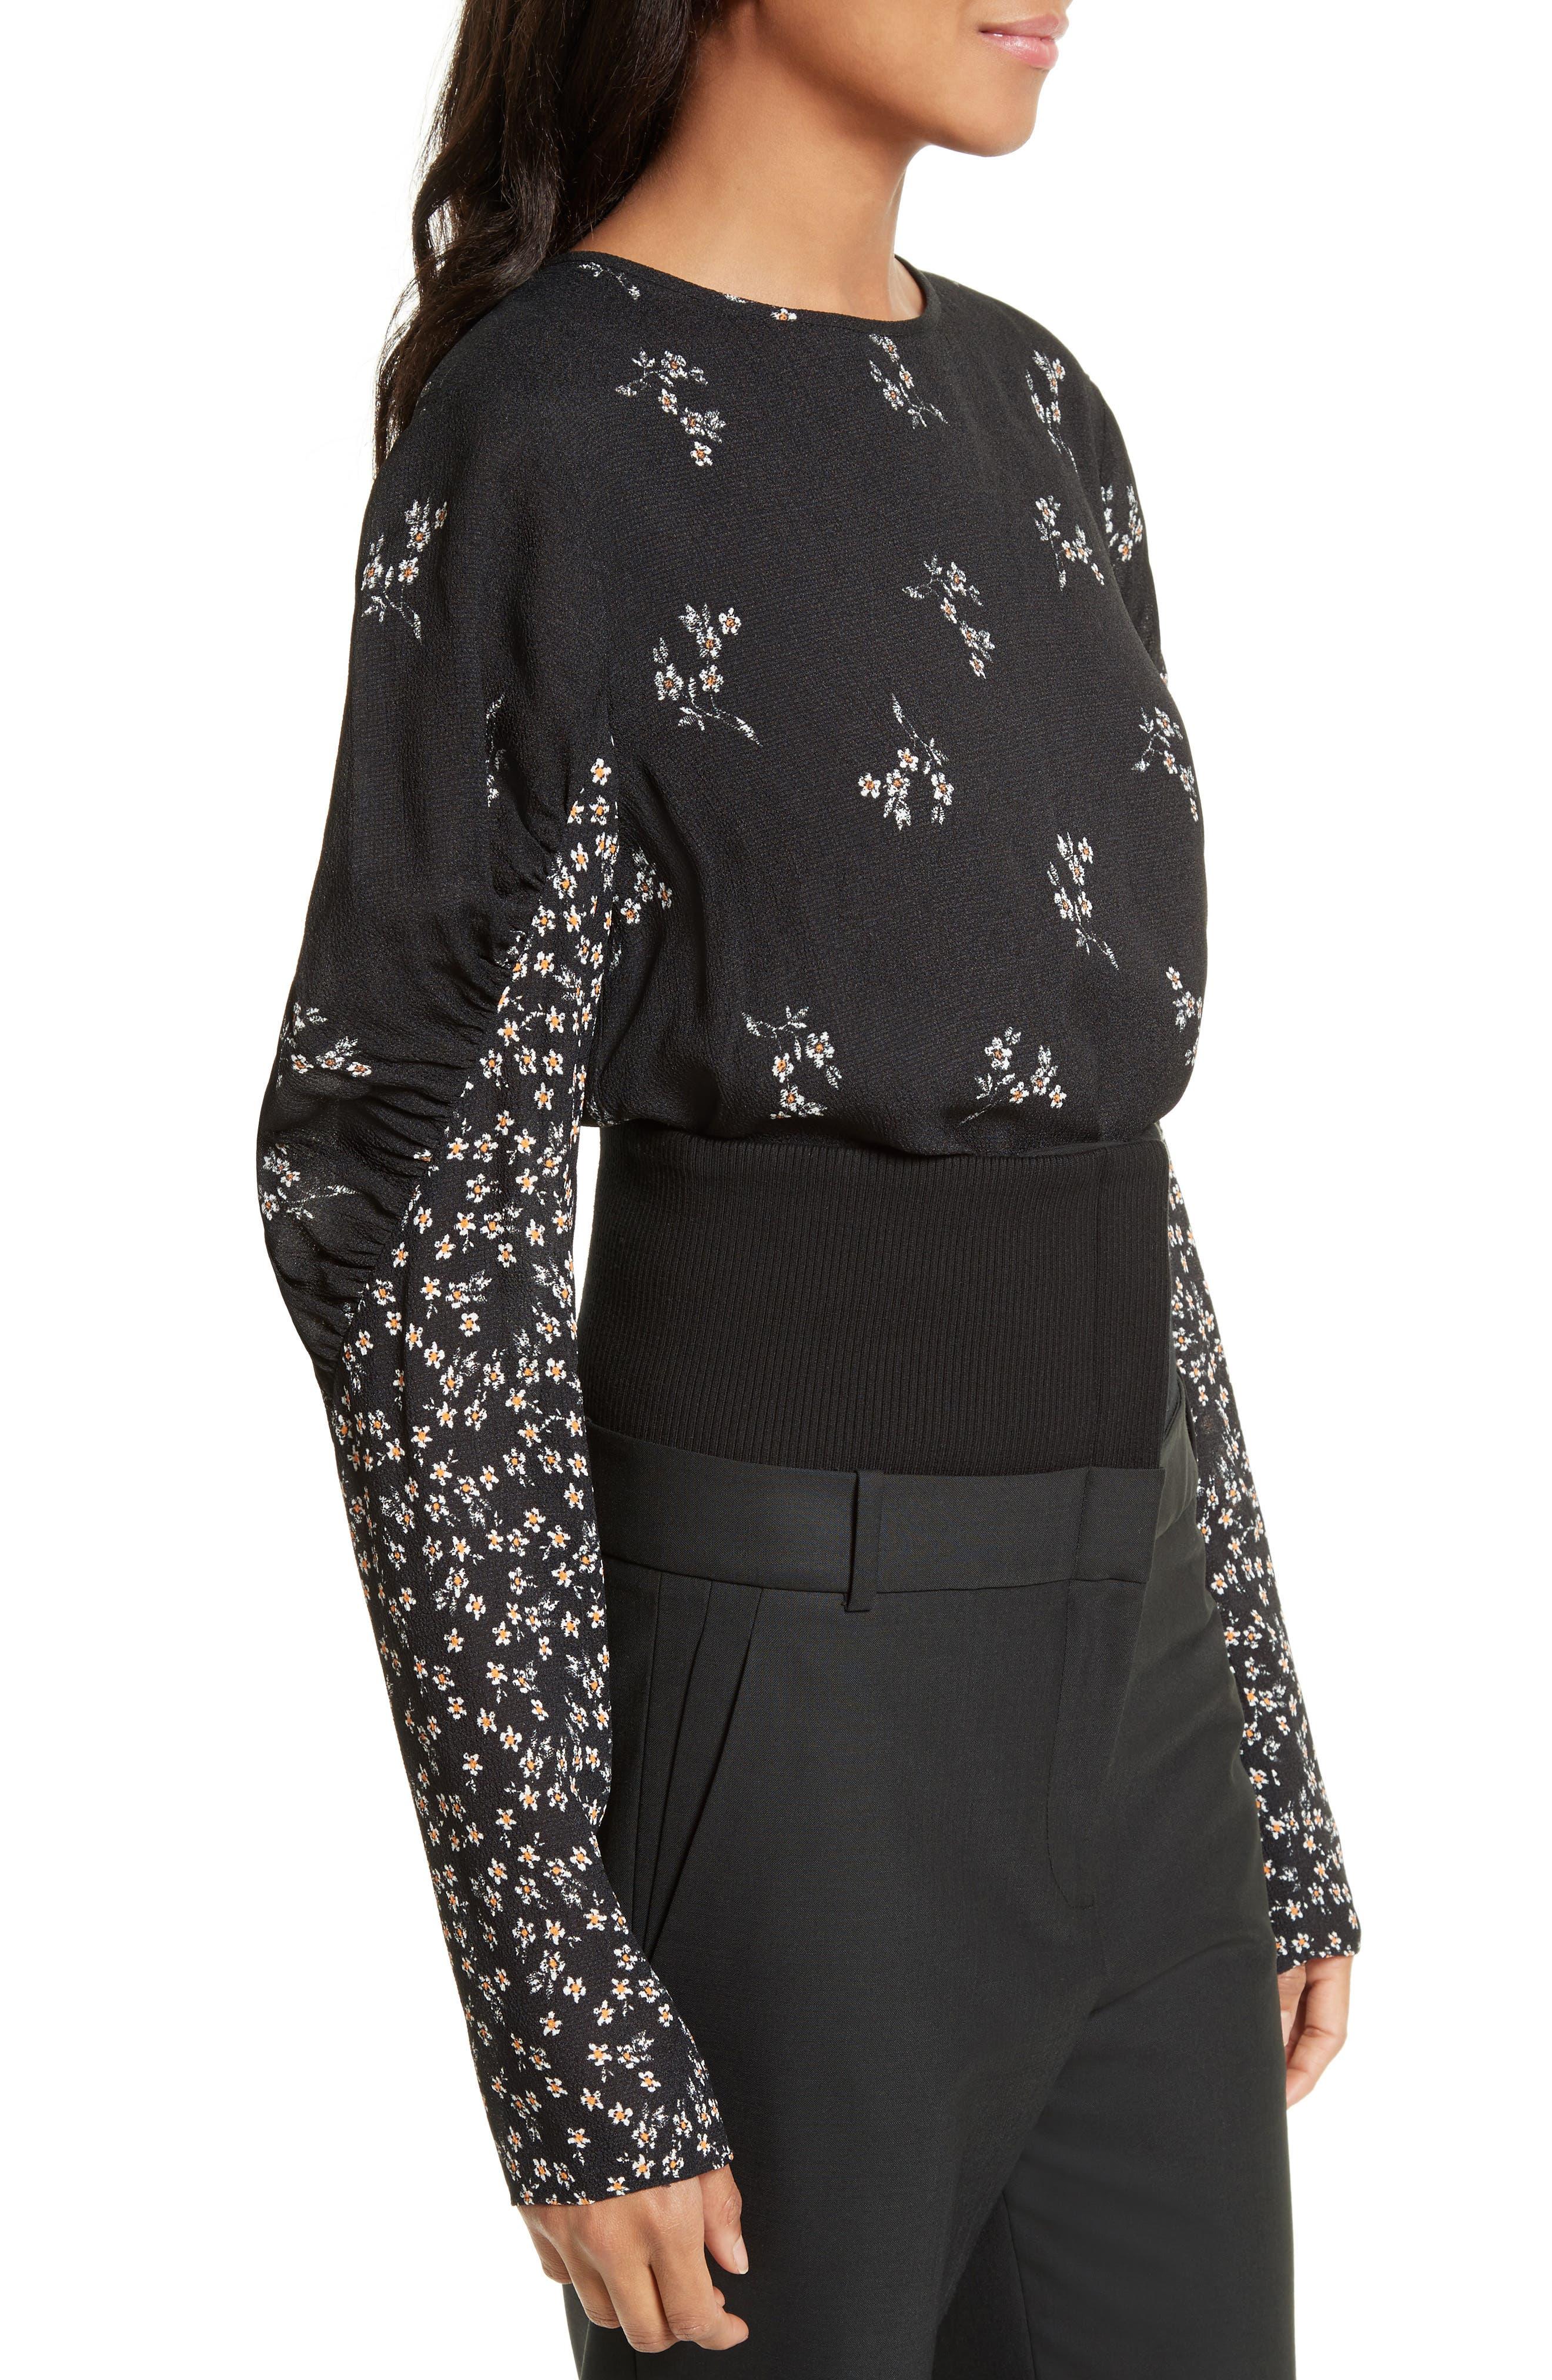 Florence Lili Floral Top,                             Alternate thumbnail 3, color,                             Black Multi